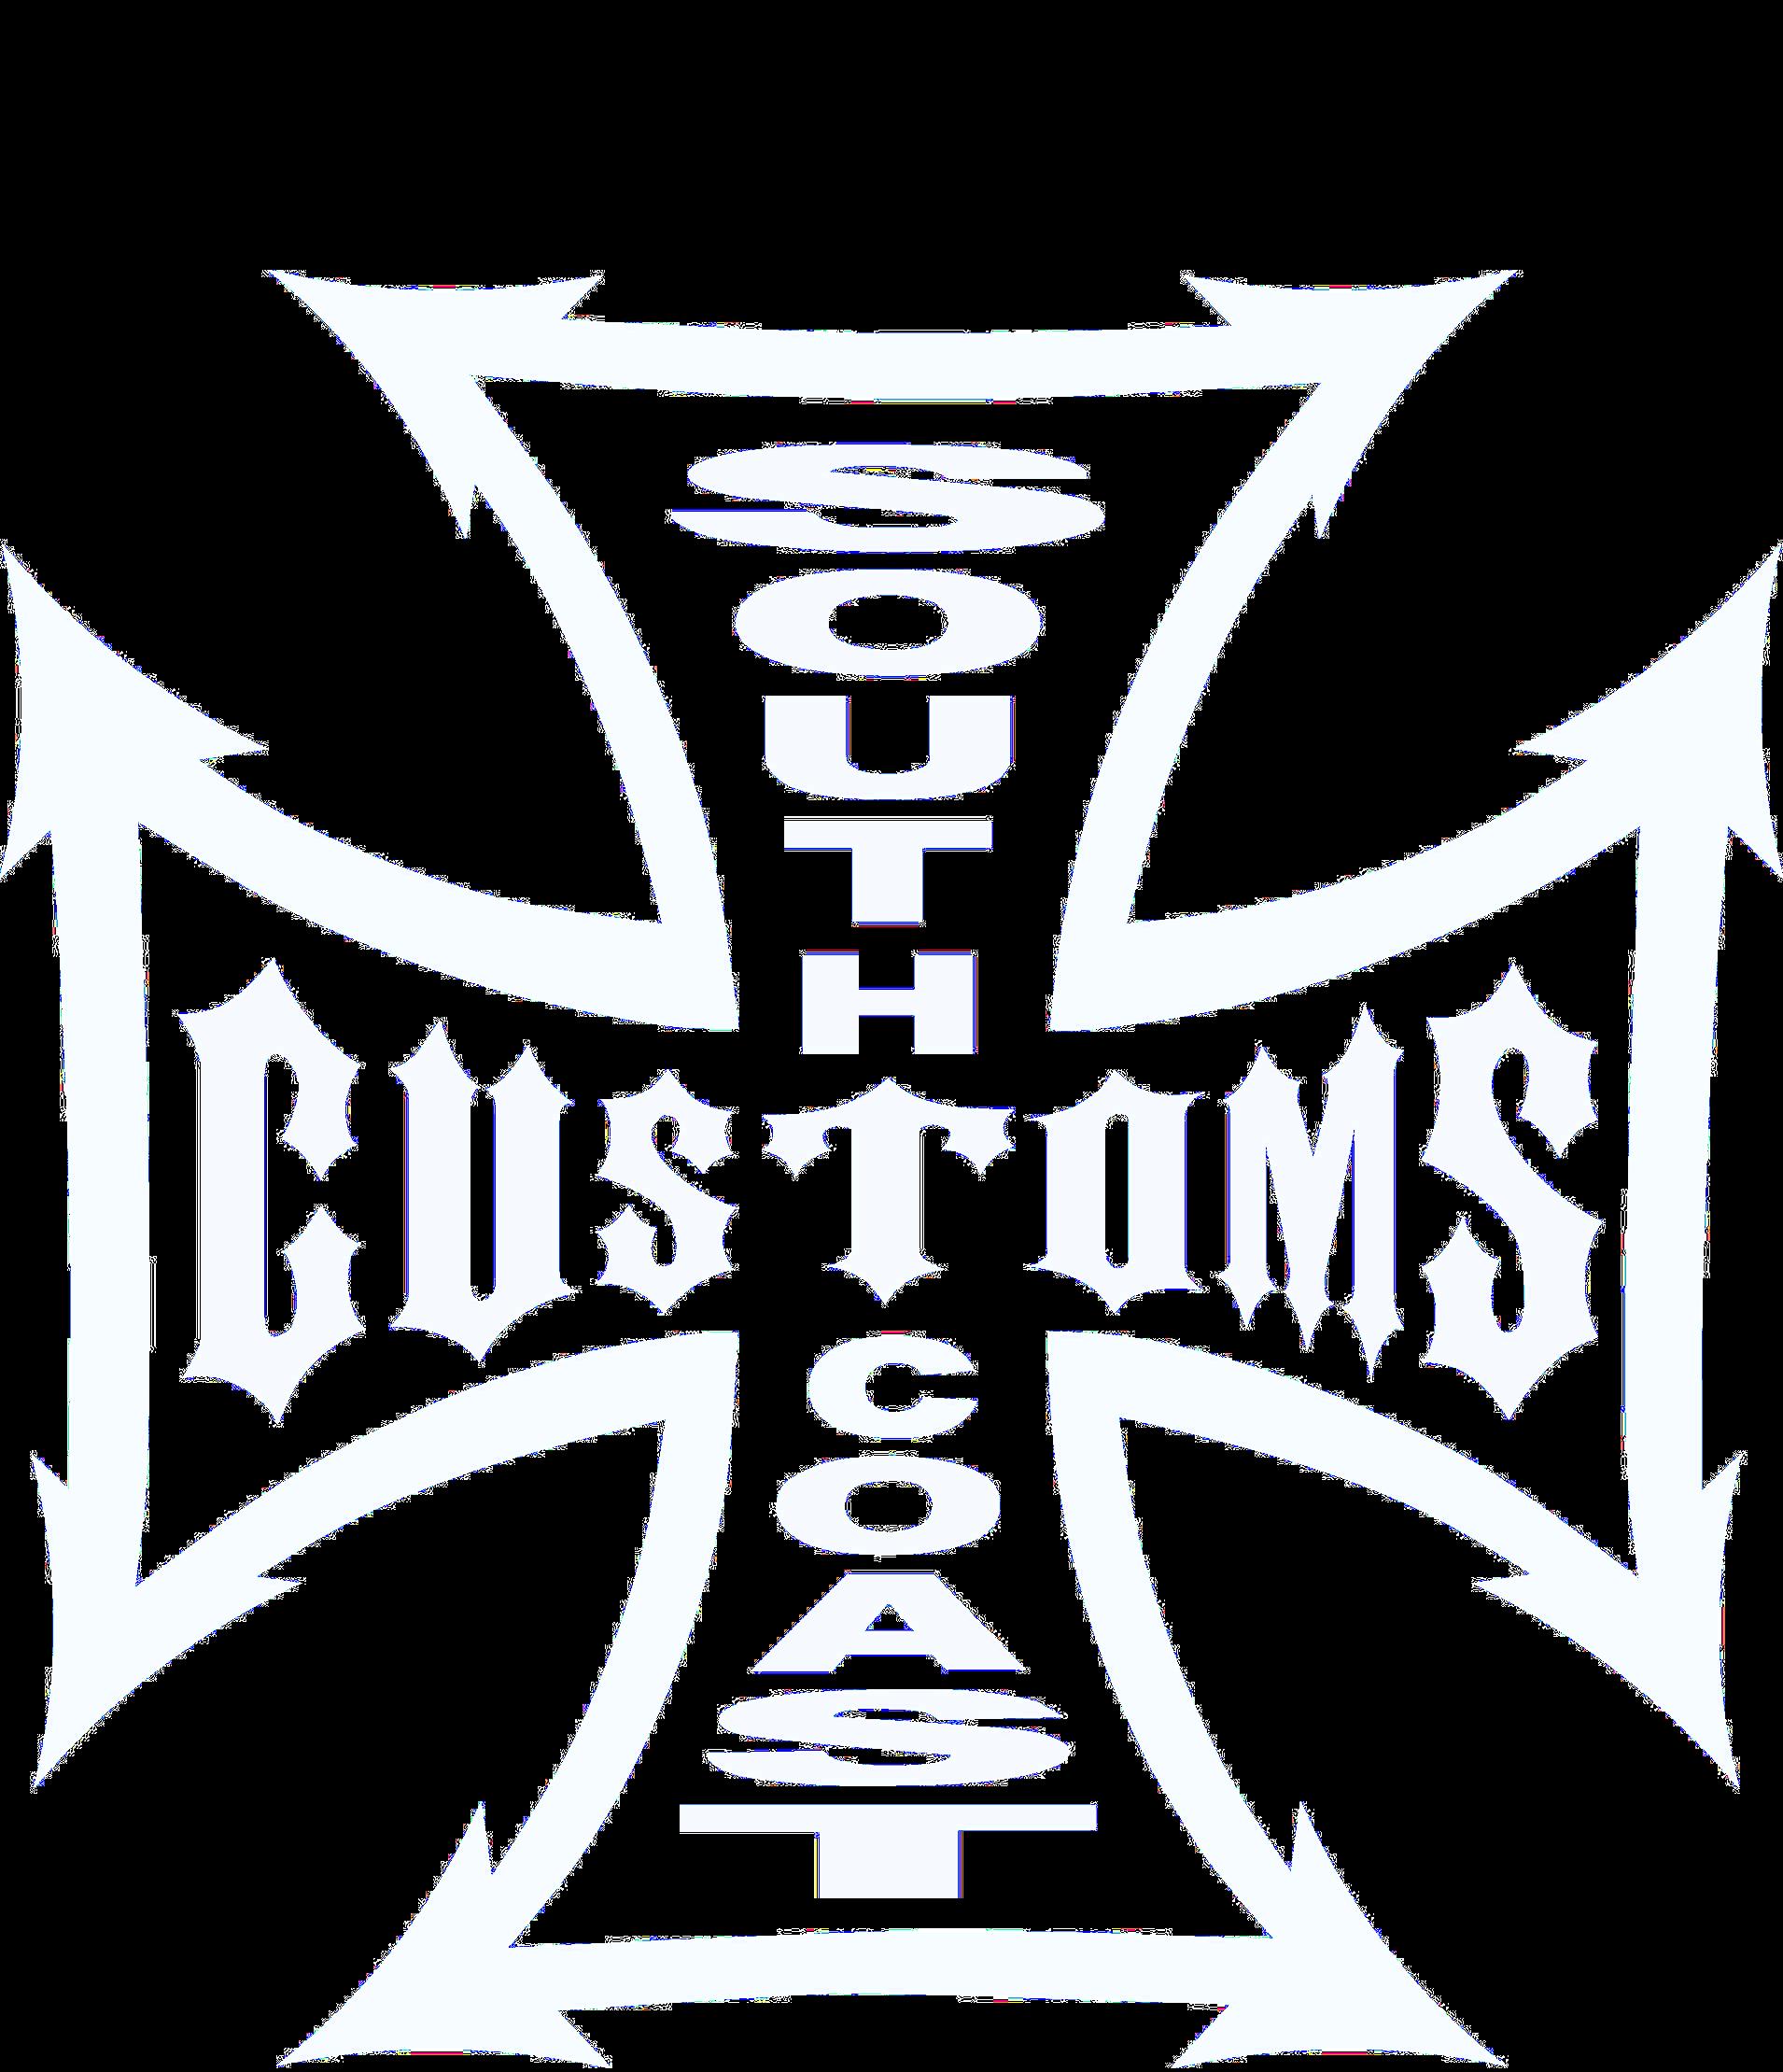 South Coast Customs